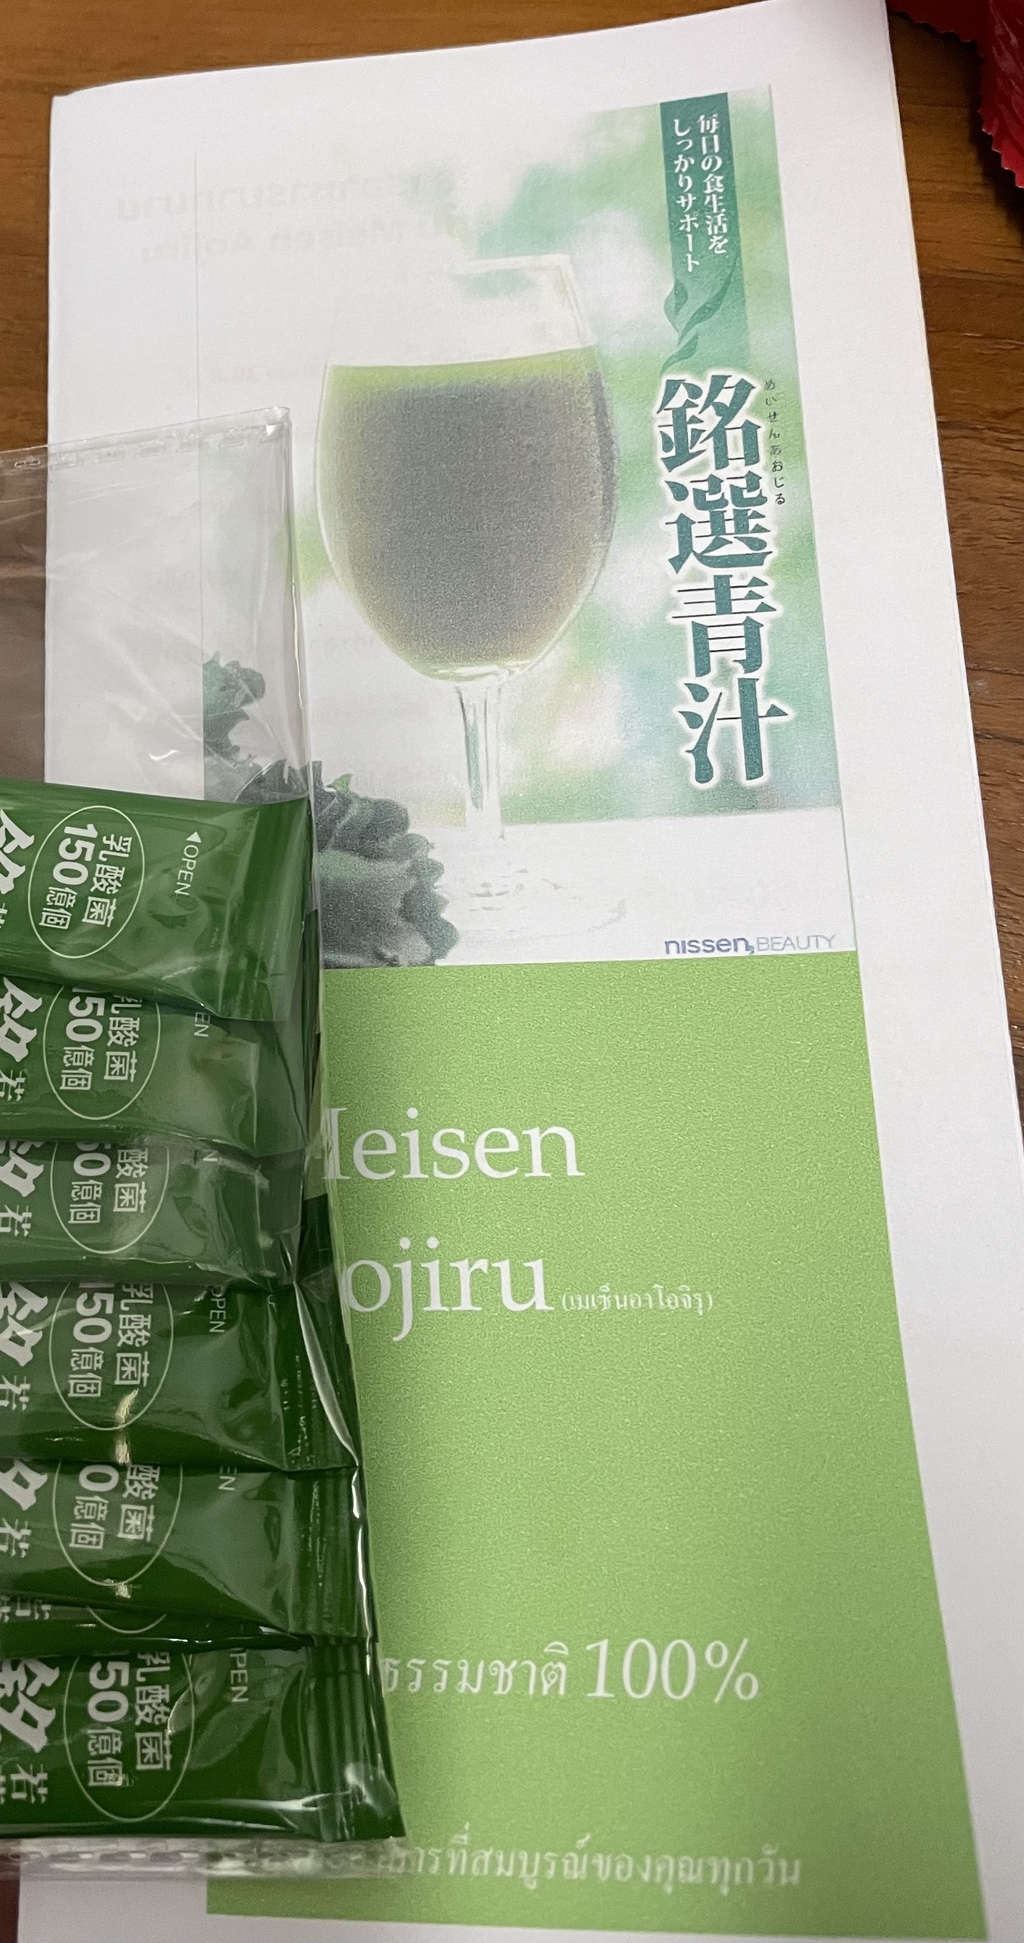 Meisen Aojiru เครื่องดื่มจากต้นอ่อนข้าวบาร์เลย์ รีวิว